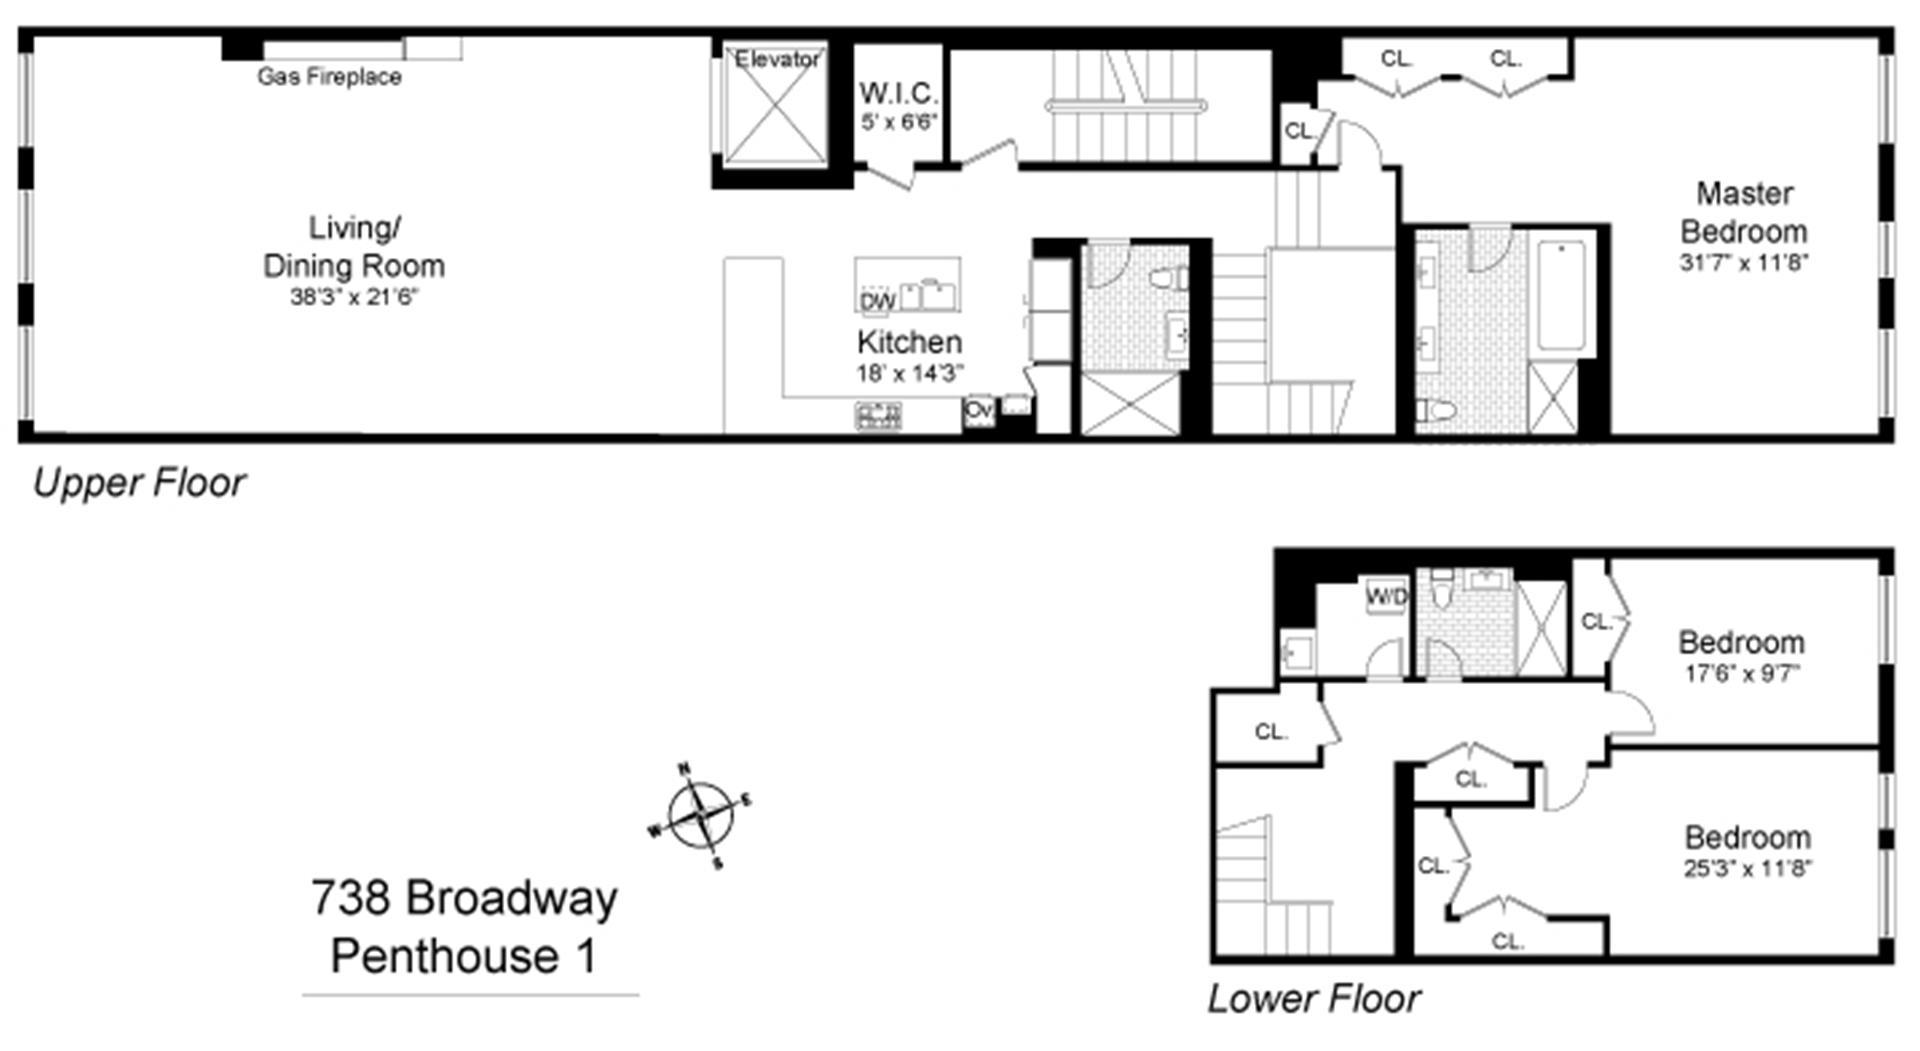 Floor plan of 738 Broadway, PH1 - Greenwich Village, New York